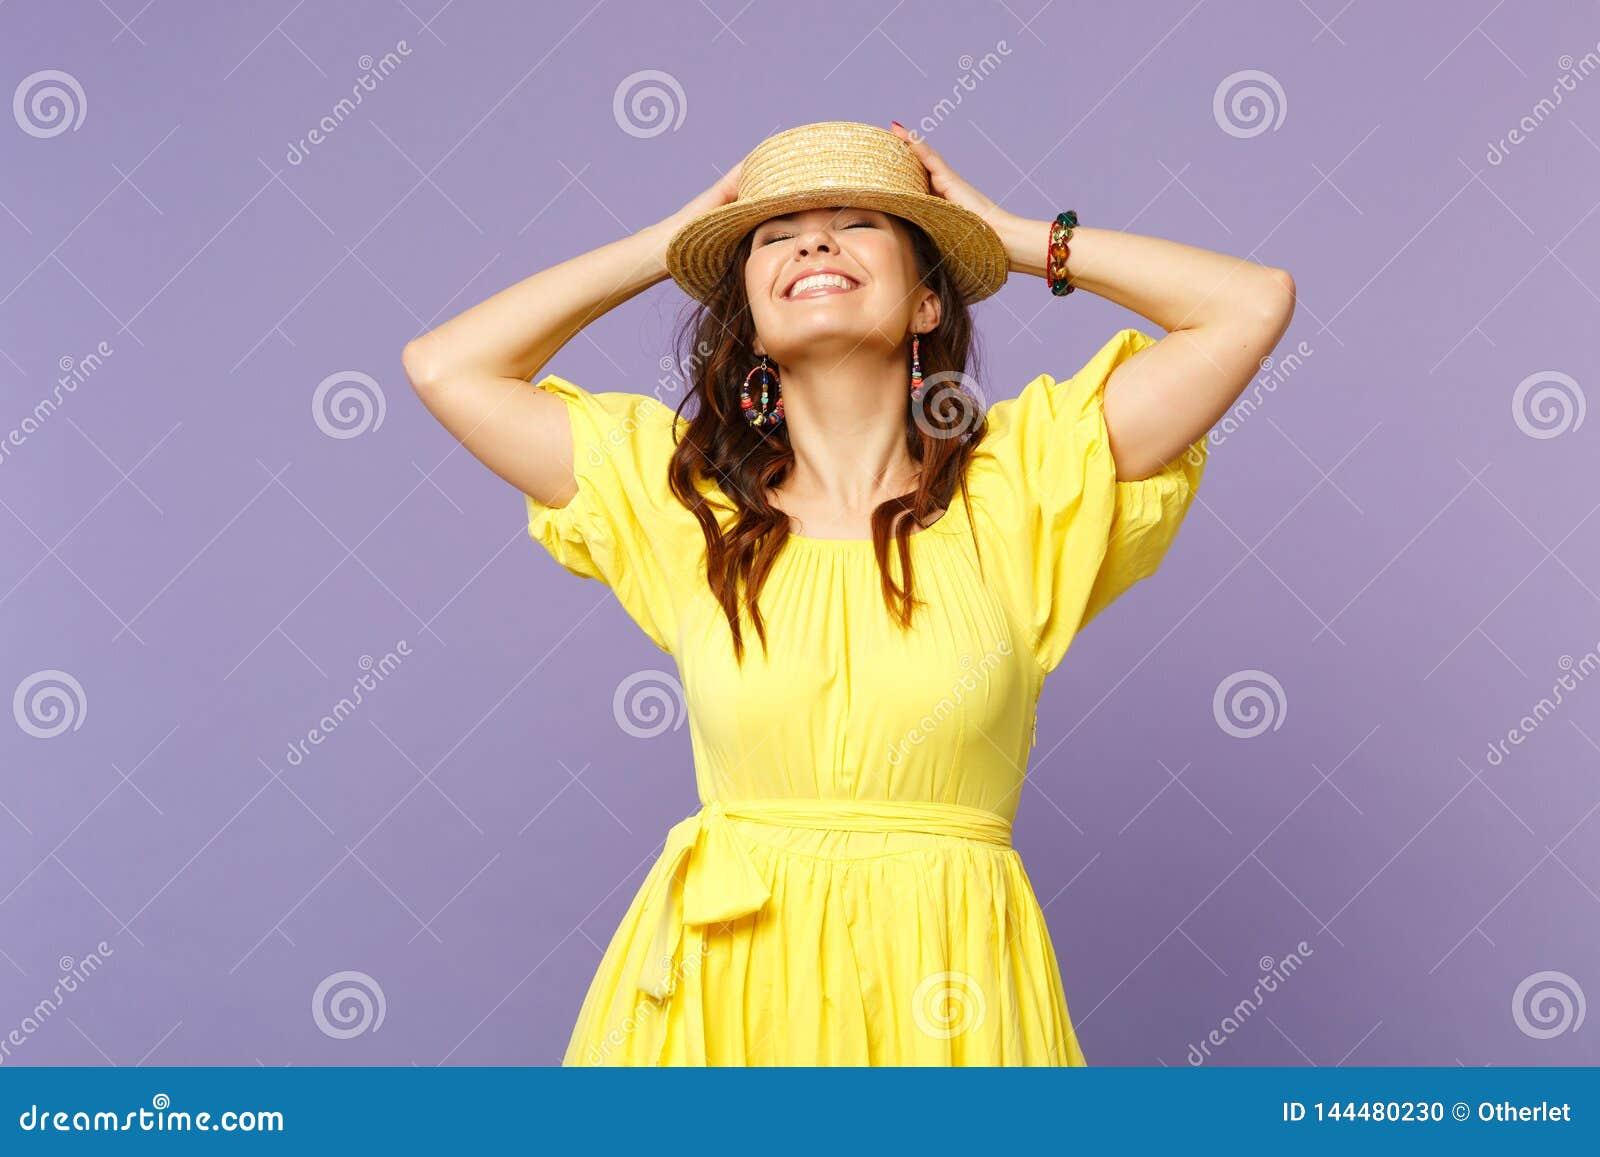 De vrij glimlachende jonge vrouw in gele kleding, de zomerhoed die ogen houden sloot, zettend handen op hoofd dat op pastelkleur